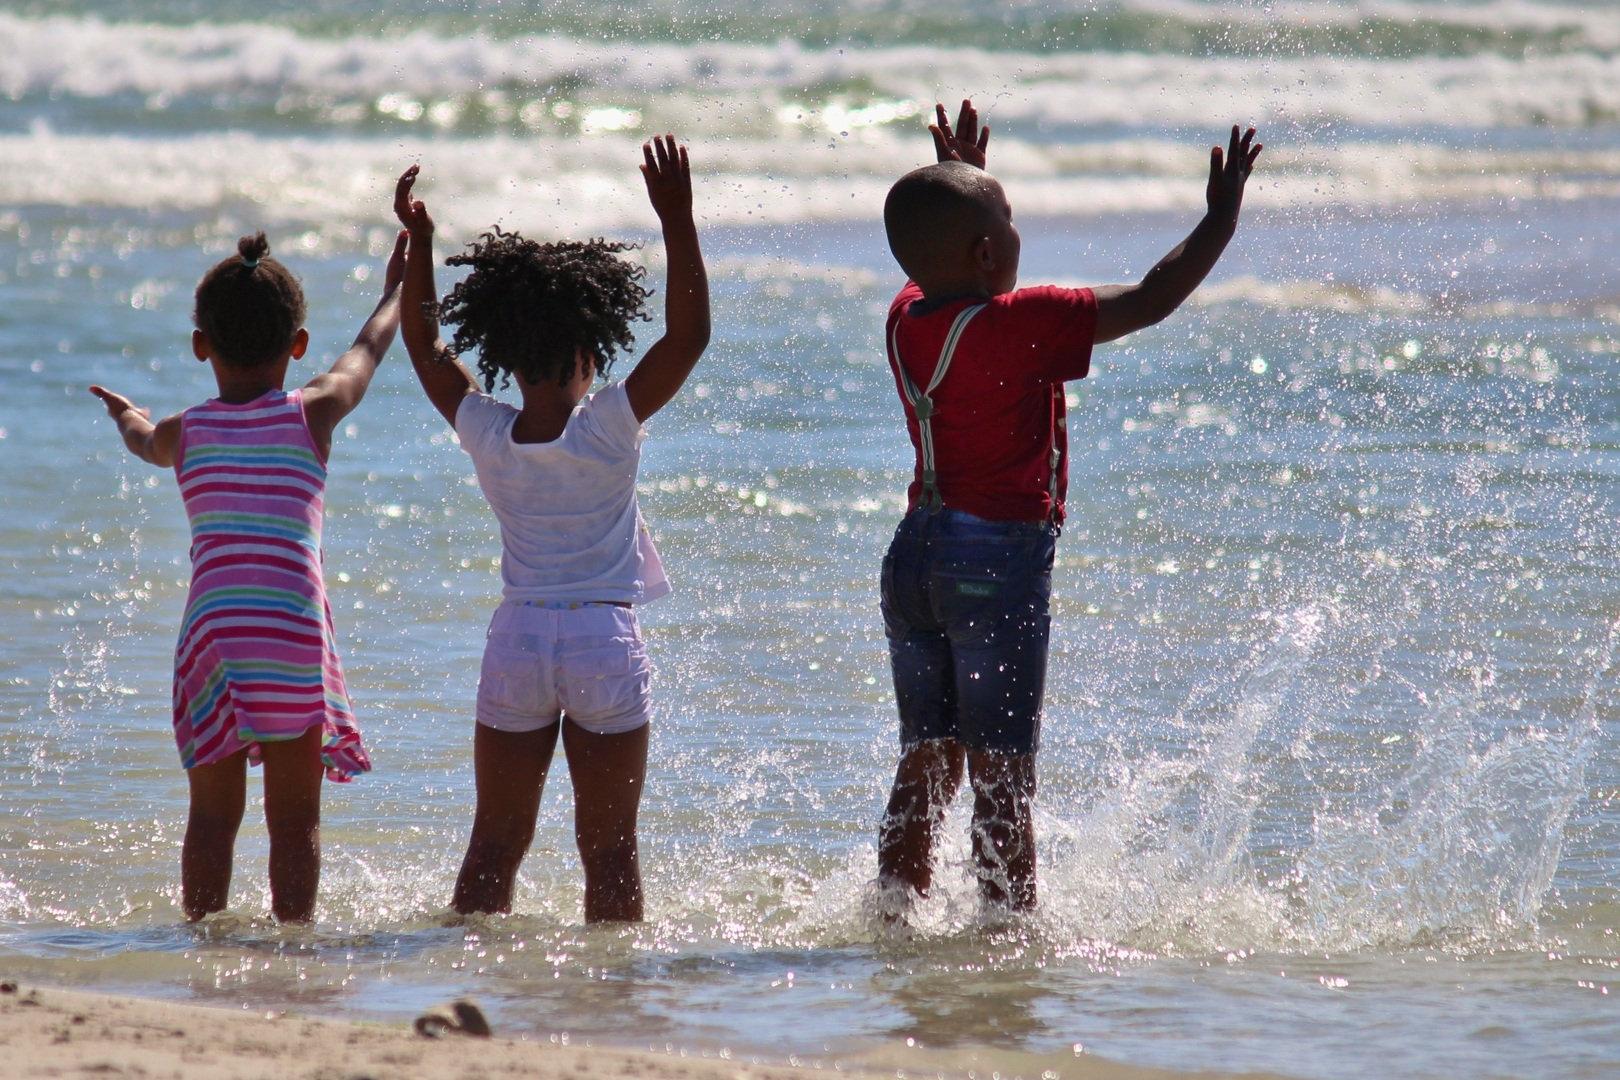 CHILDREN AND ADOLESCENCES